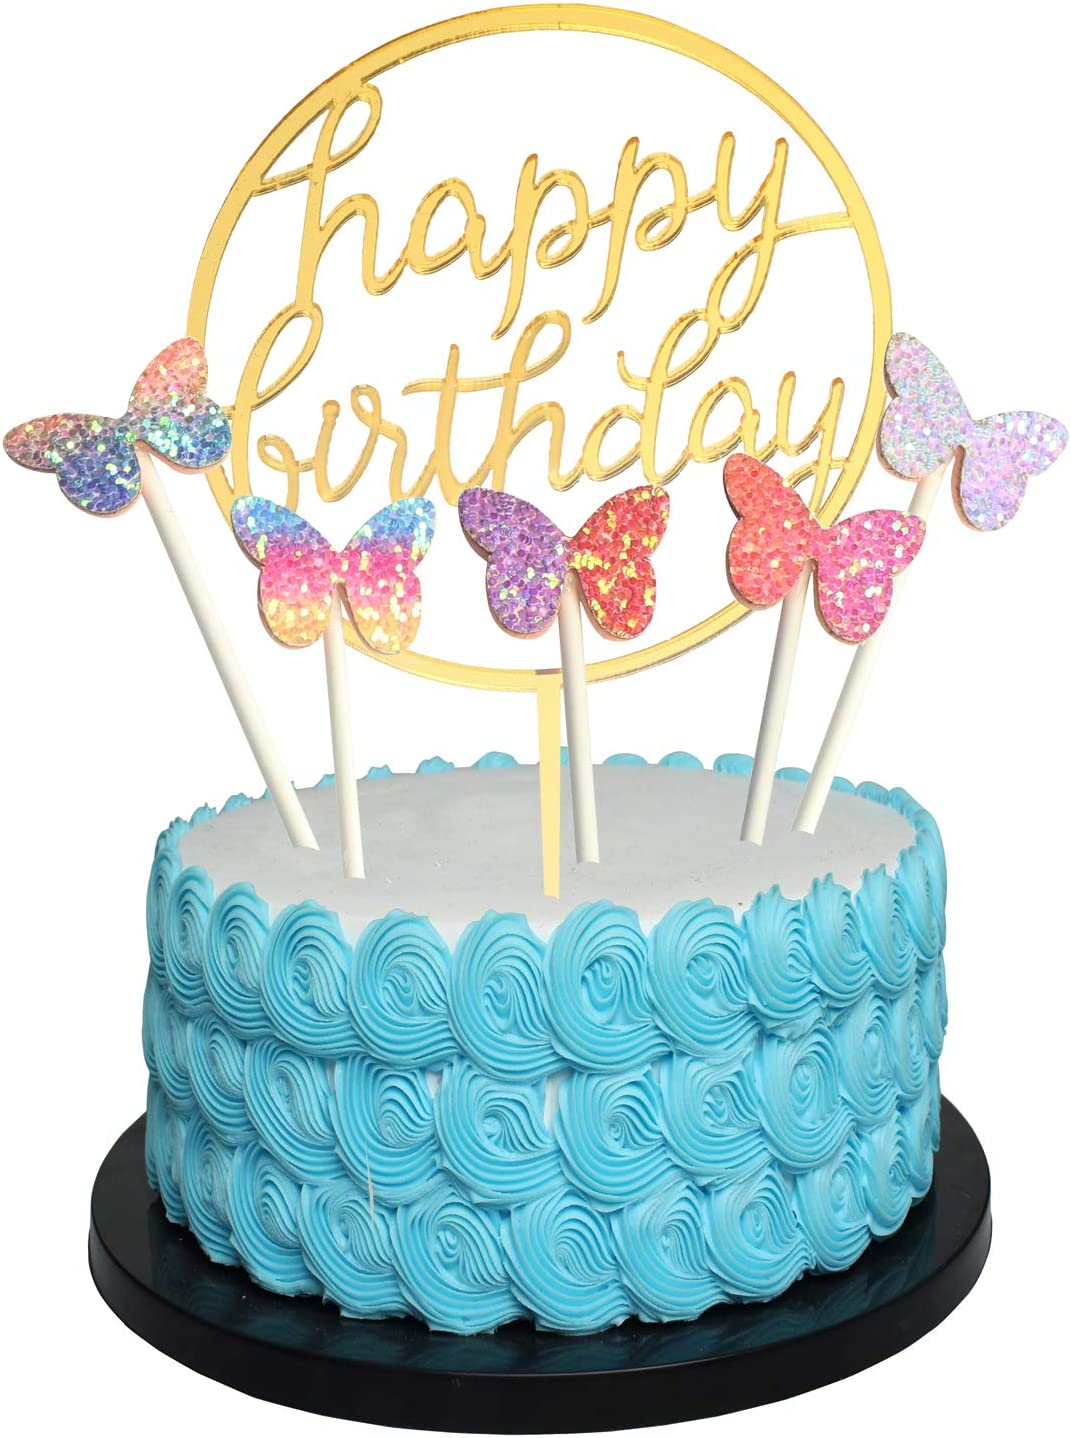 Astounding Amazon Com Happy Birthday Cake Topper Acrylic Gold Twinkle Diy Personalised Birthday Cards Petedlily Jamesorg